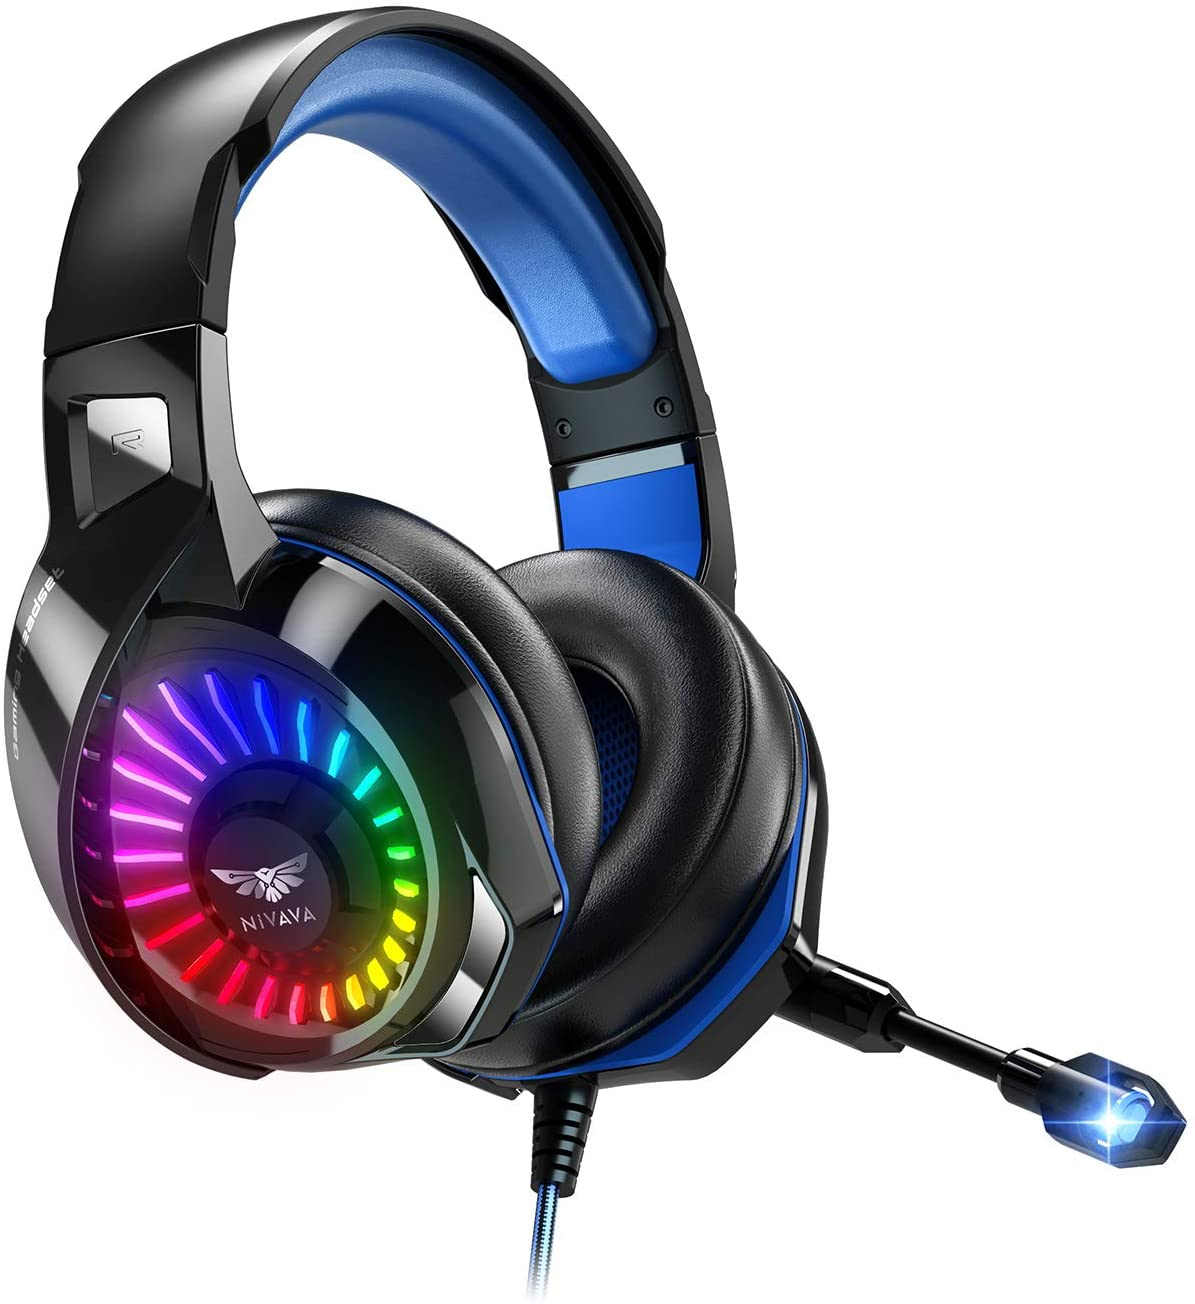 Nivava K7 Pro Gaming Headset